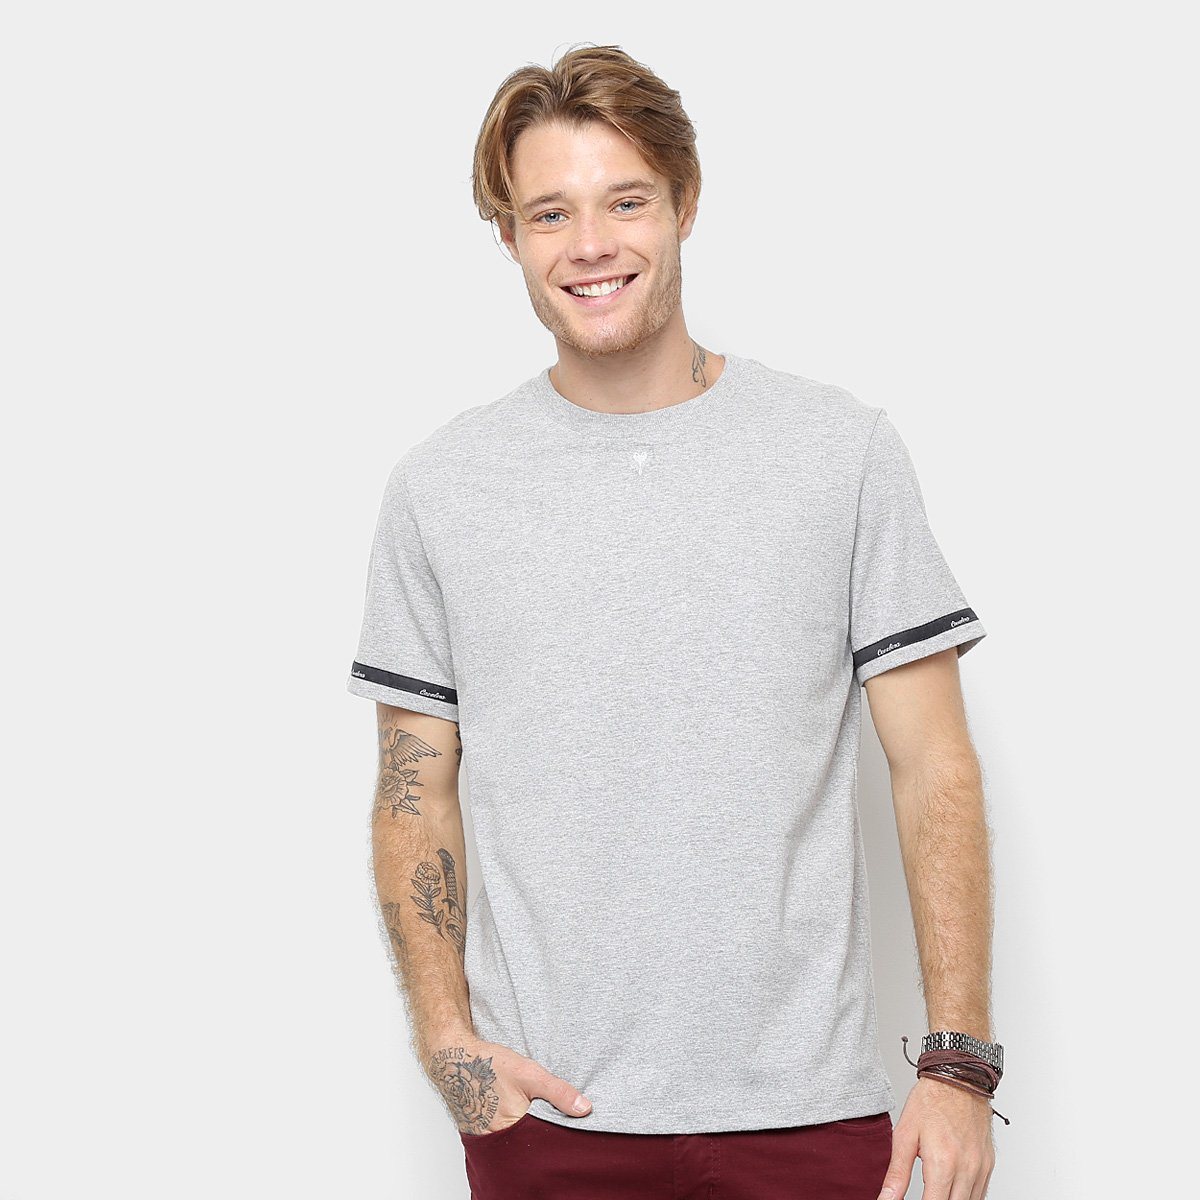 19d67a8fa7 Camiseta Cavalera Detalhe Fita Masculina - Mescla